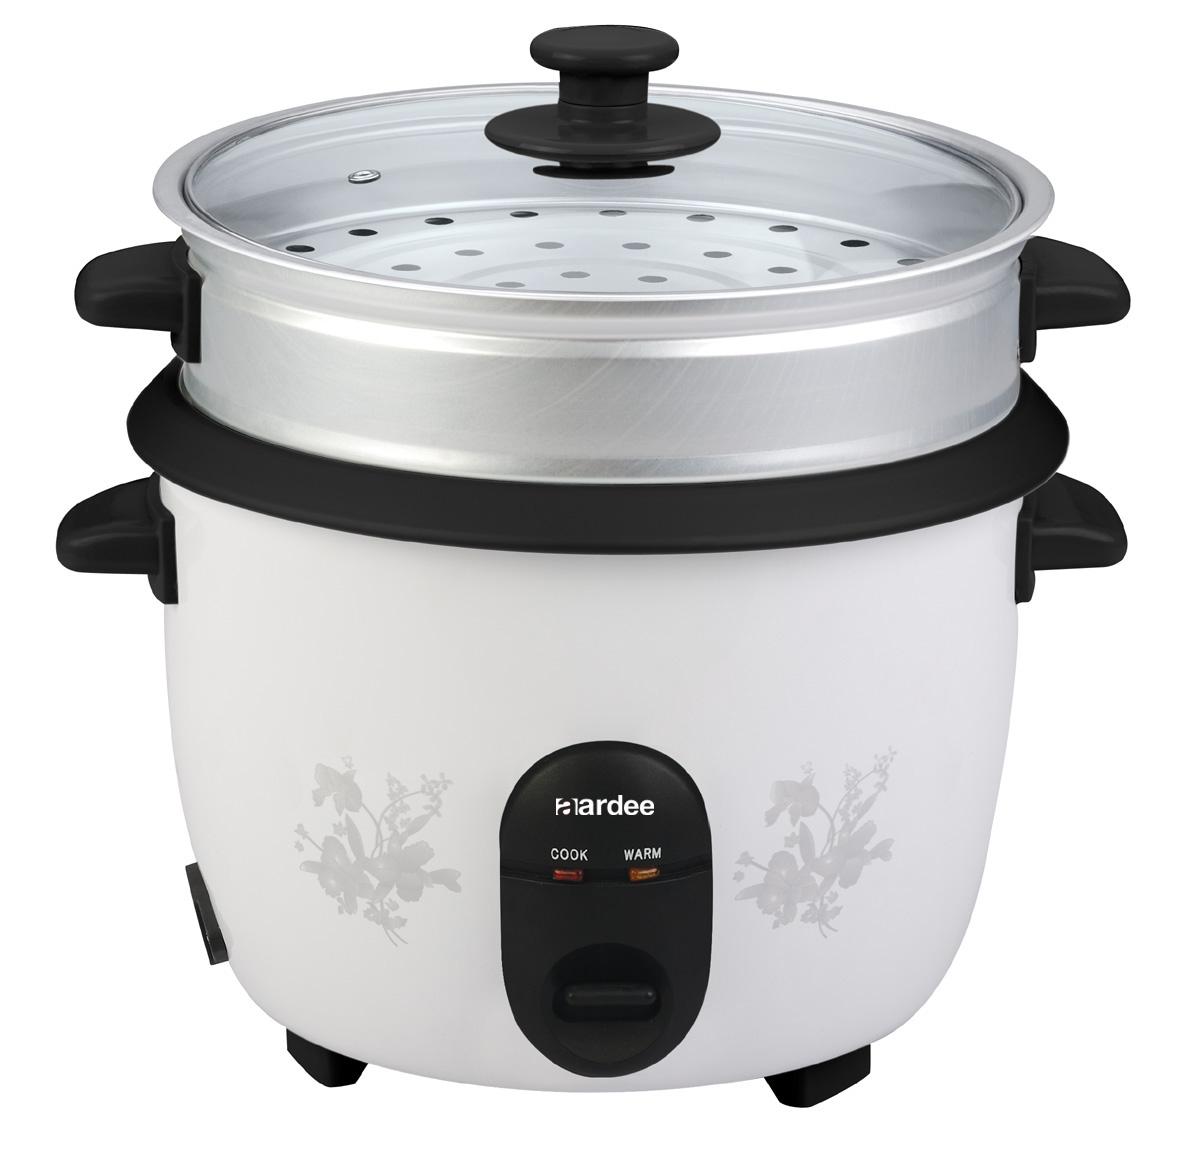 Aardee 1.8 Ltr Rice Cooker ARRC-1800D